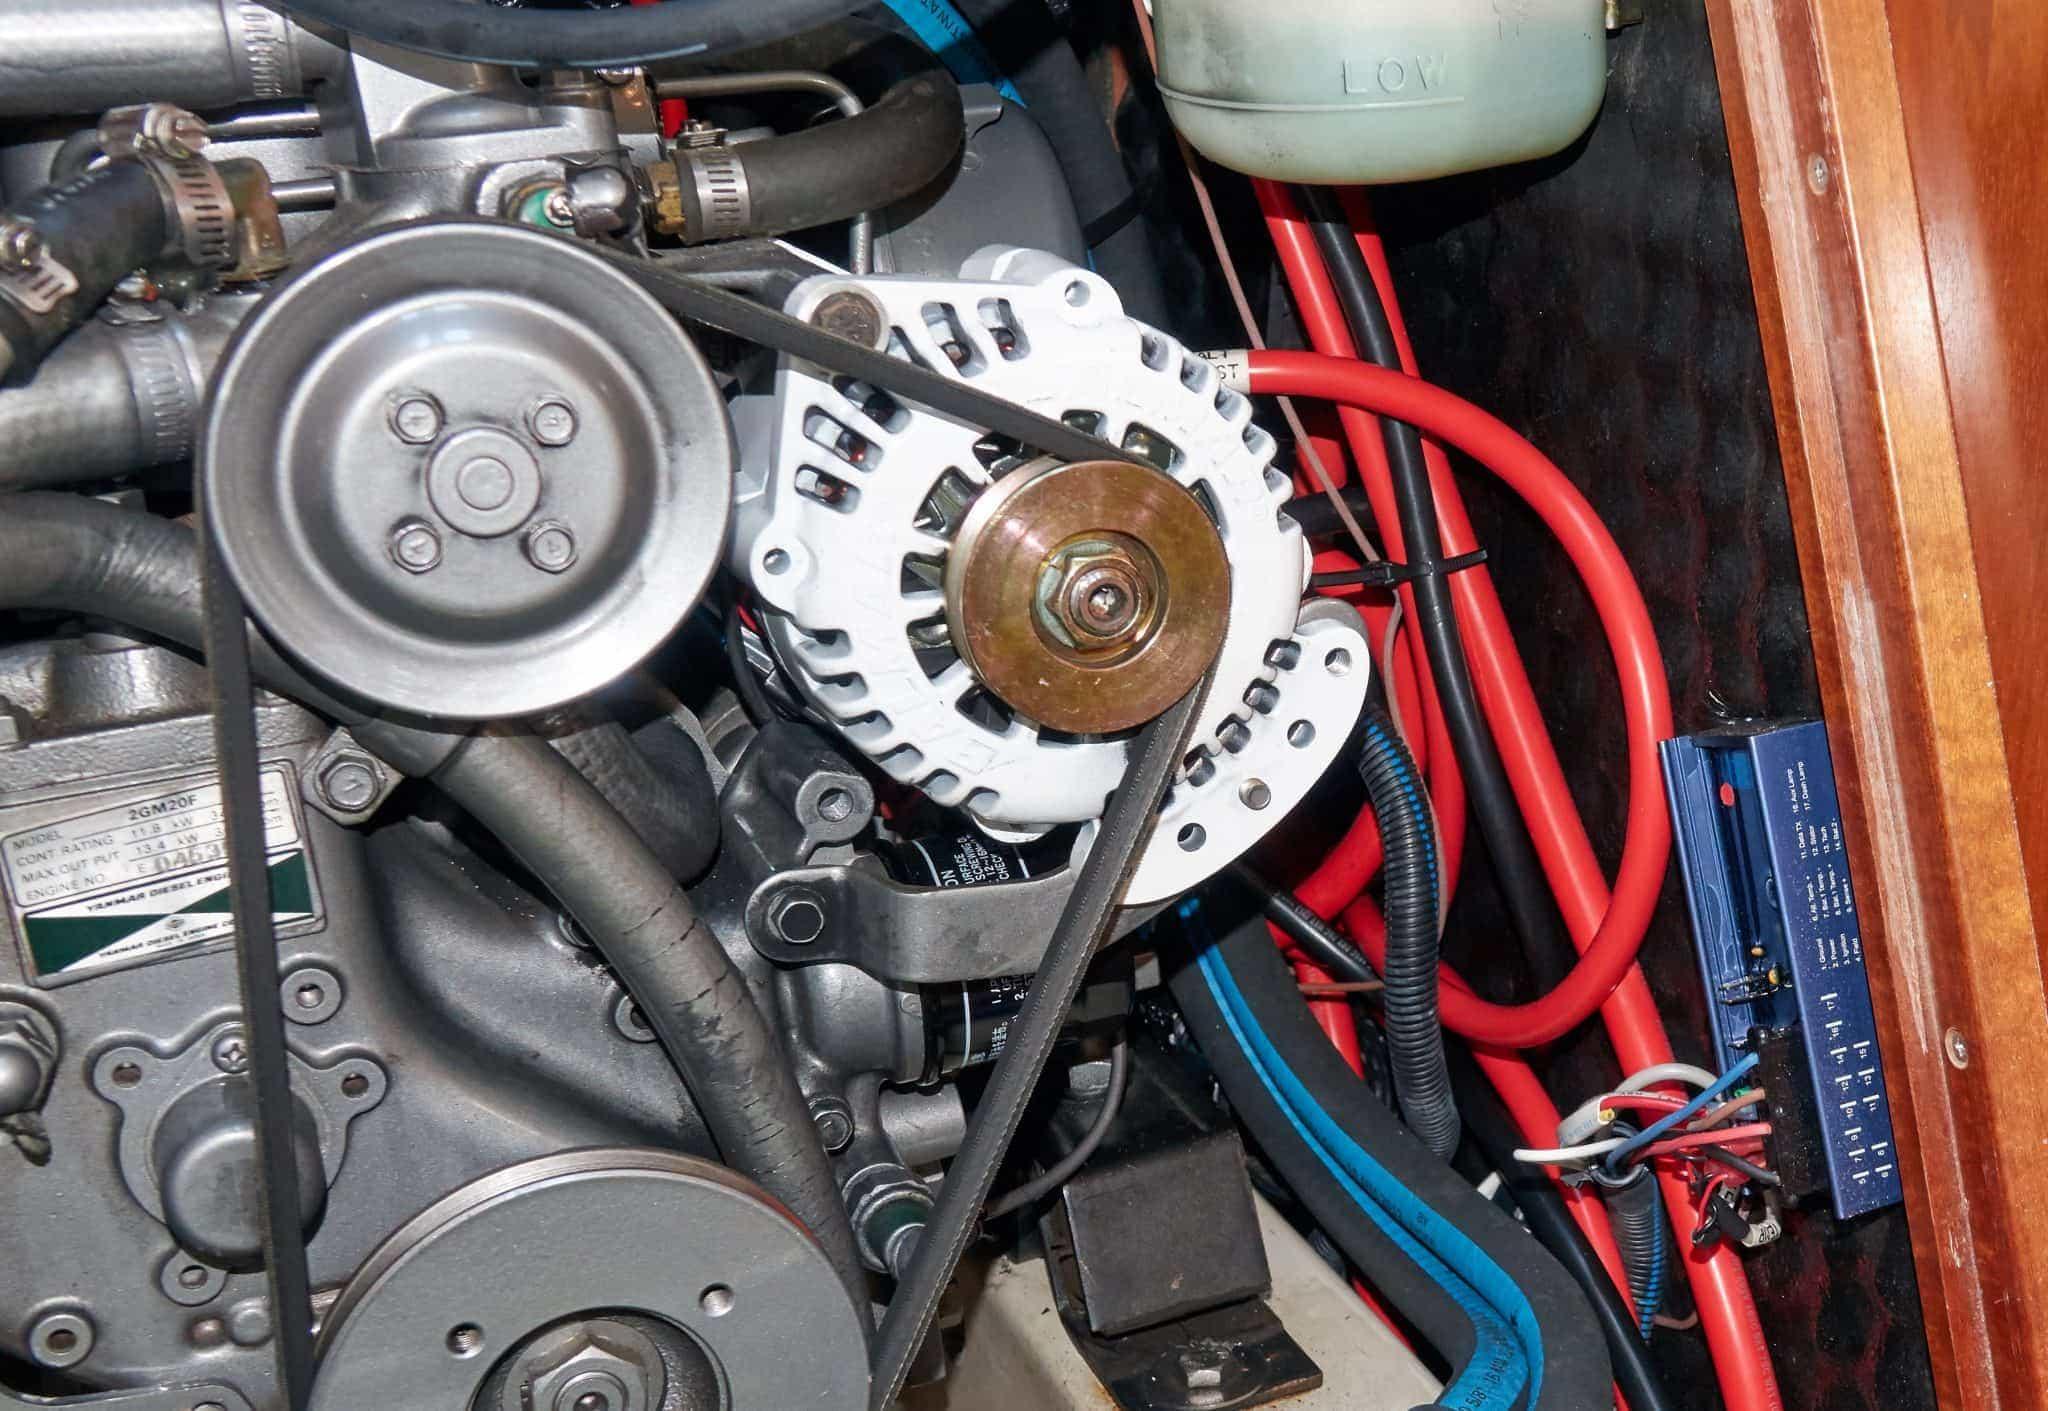 Balmar alternator and regulator